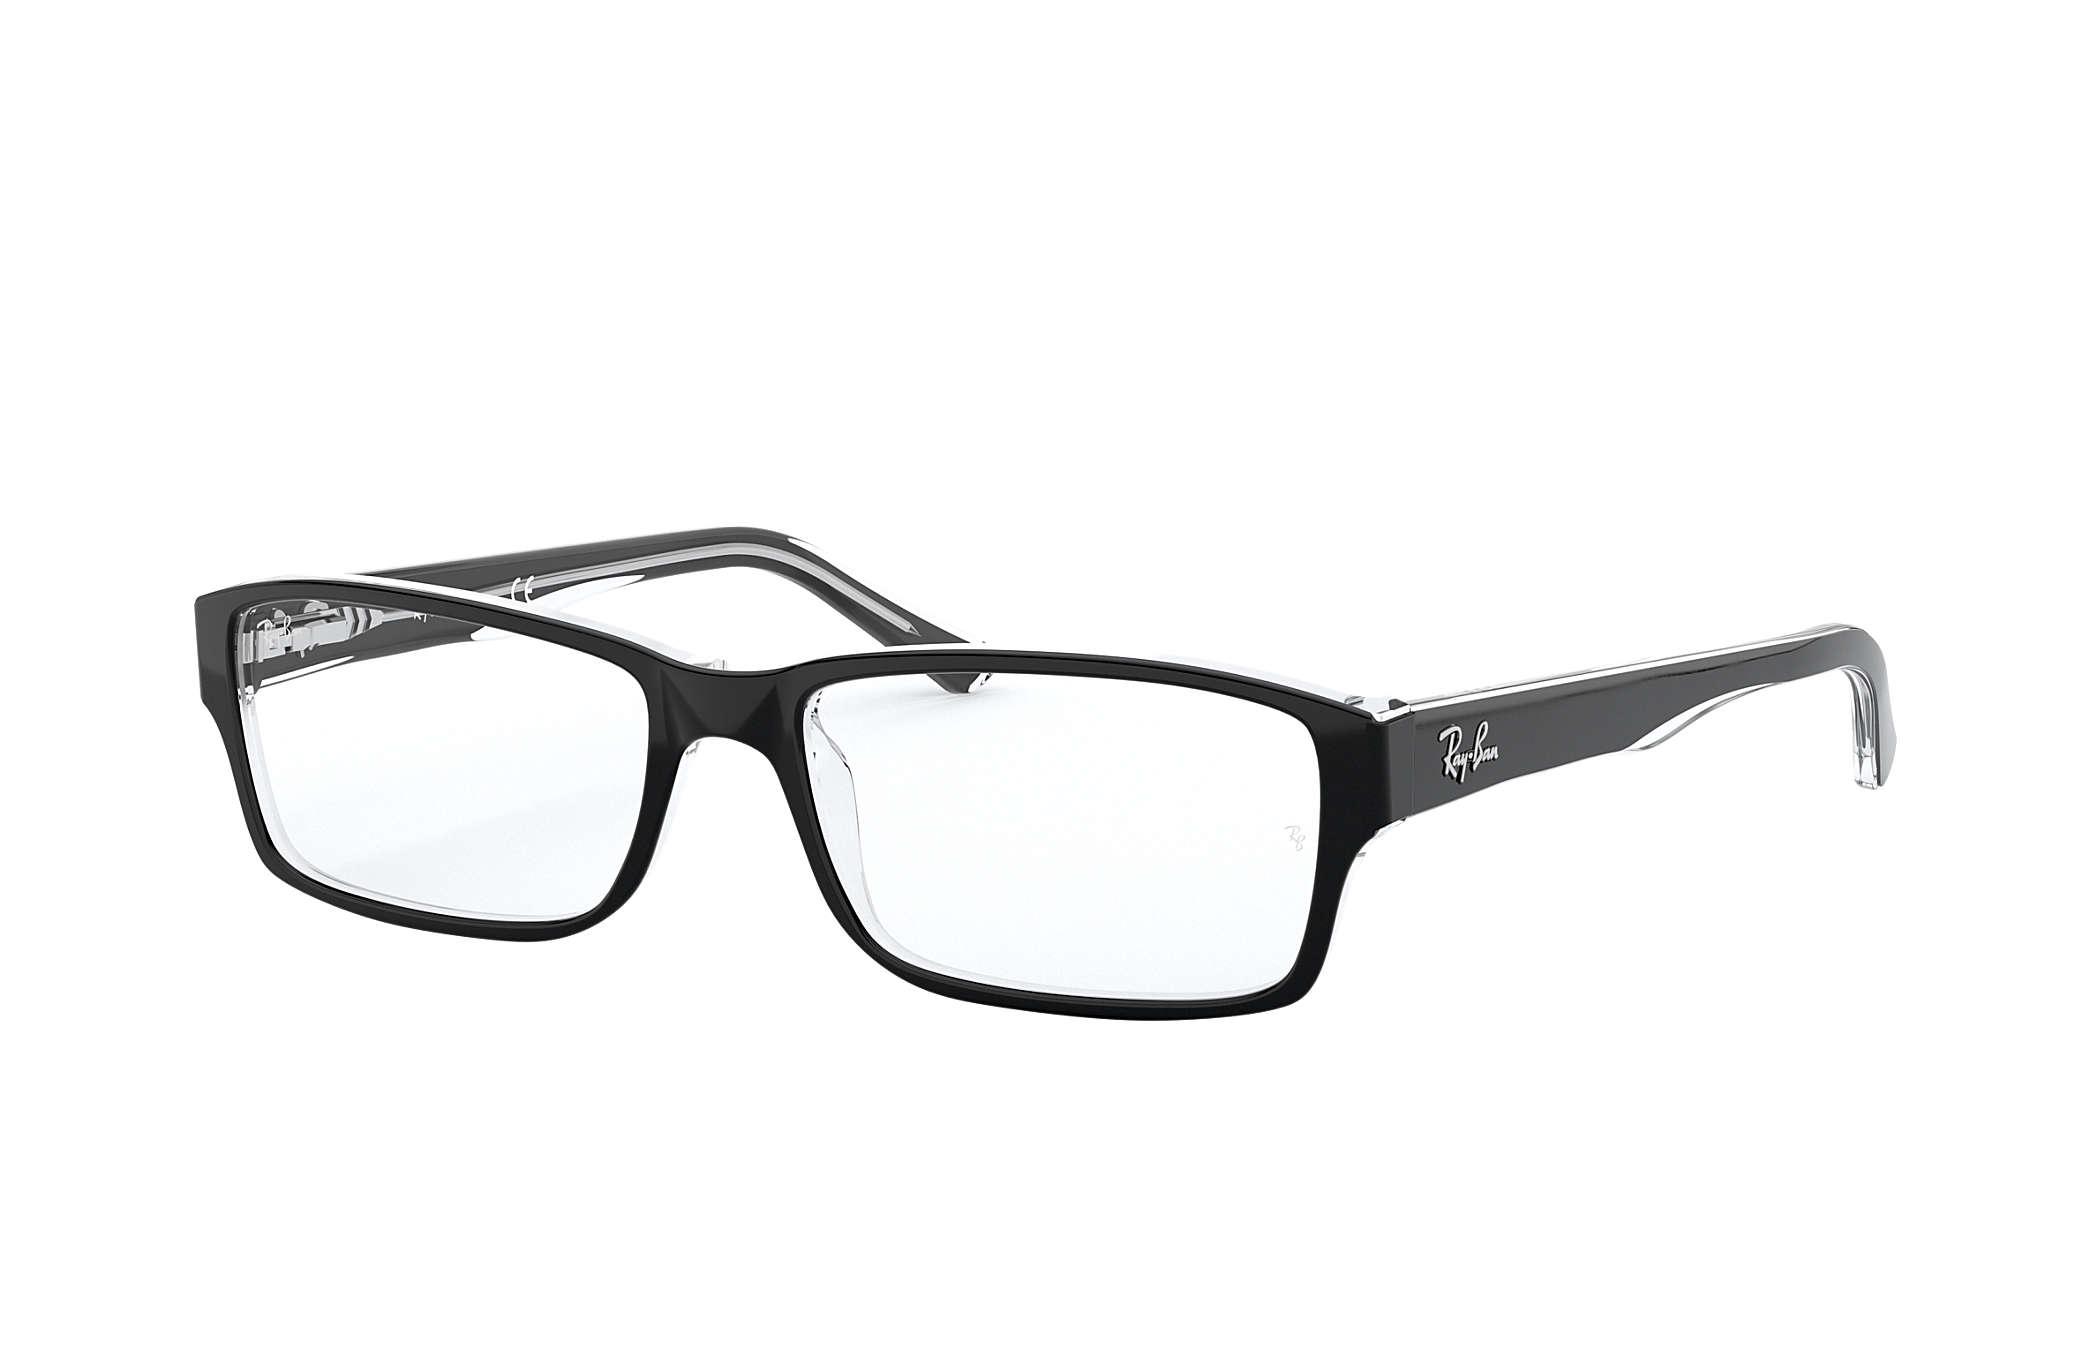 Ray-Ban prescription glasses RB5169 Black - Acetate - 0RX5169203454 ...